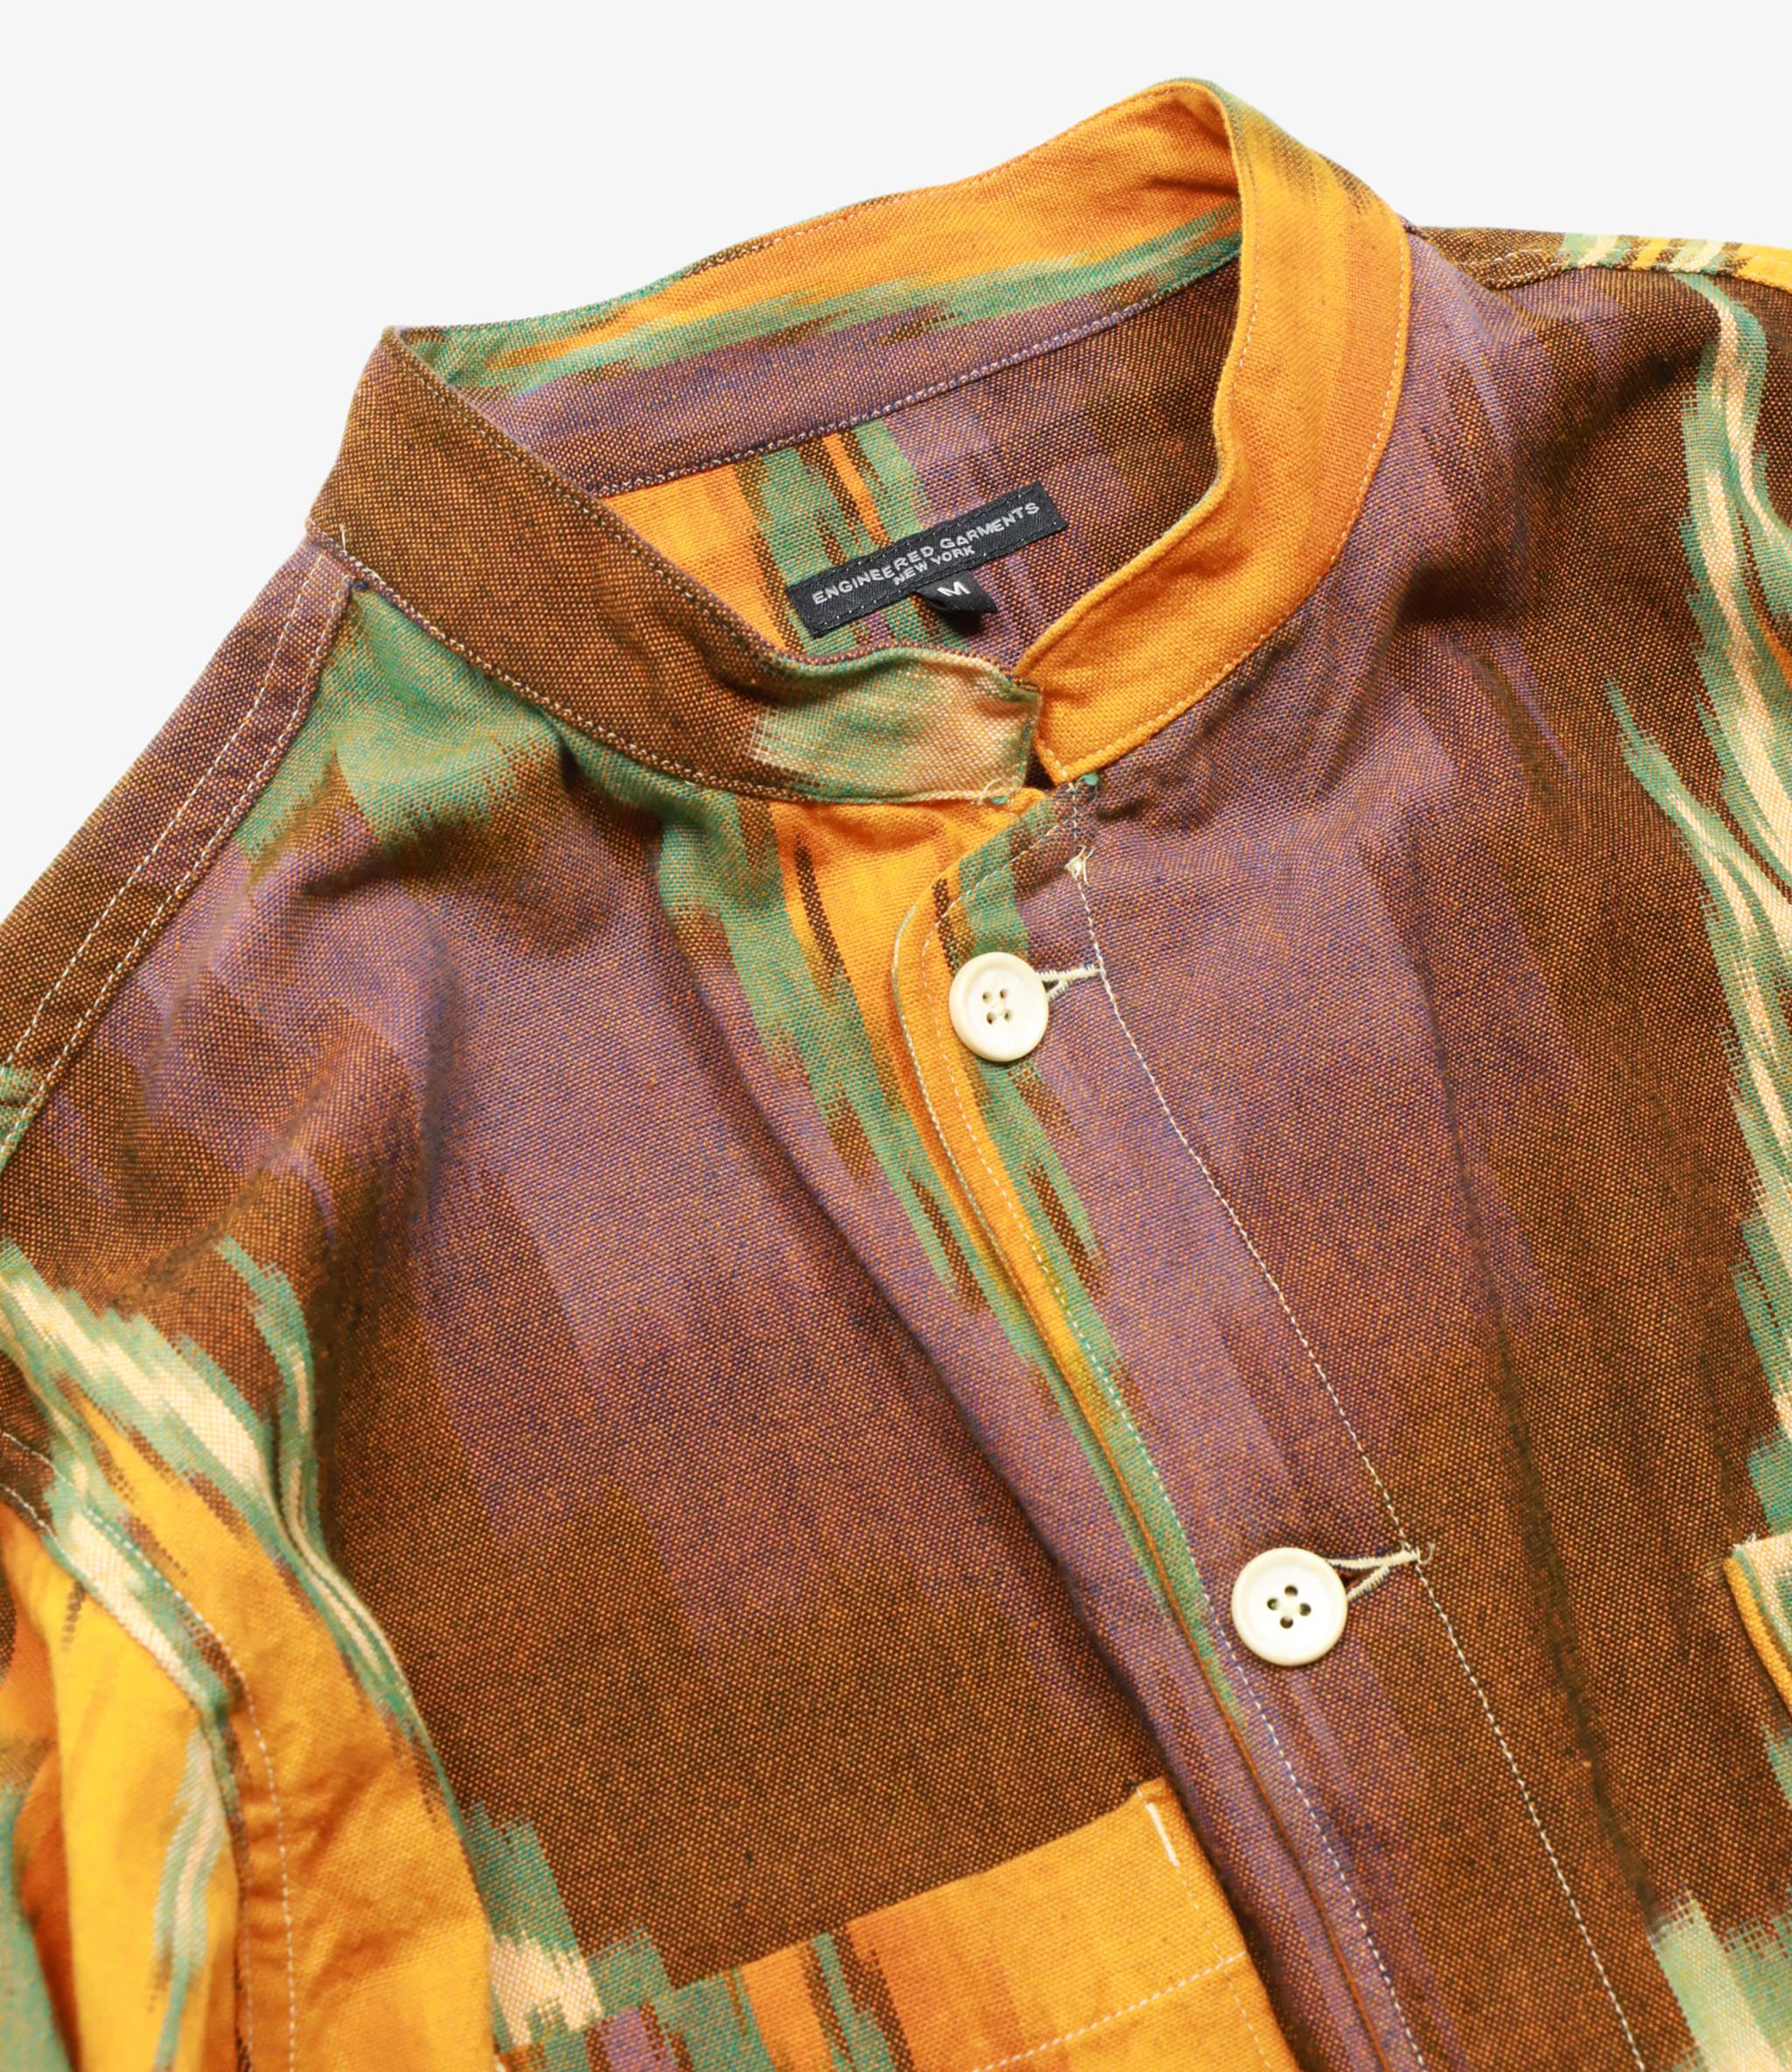 Engineered Garments Dayton Shirt - Yellow/Green Cotton Ikat